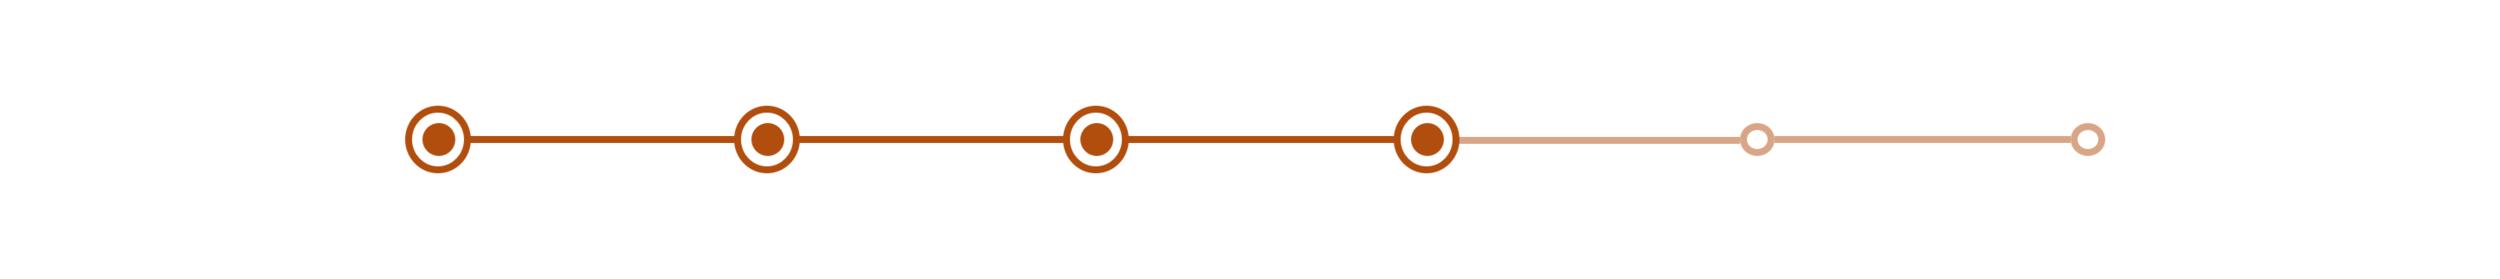 progressbar_4_long.png